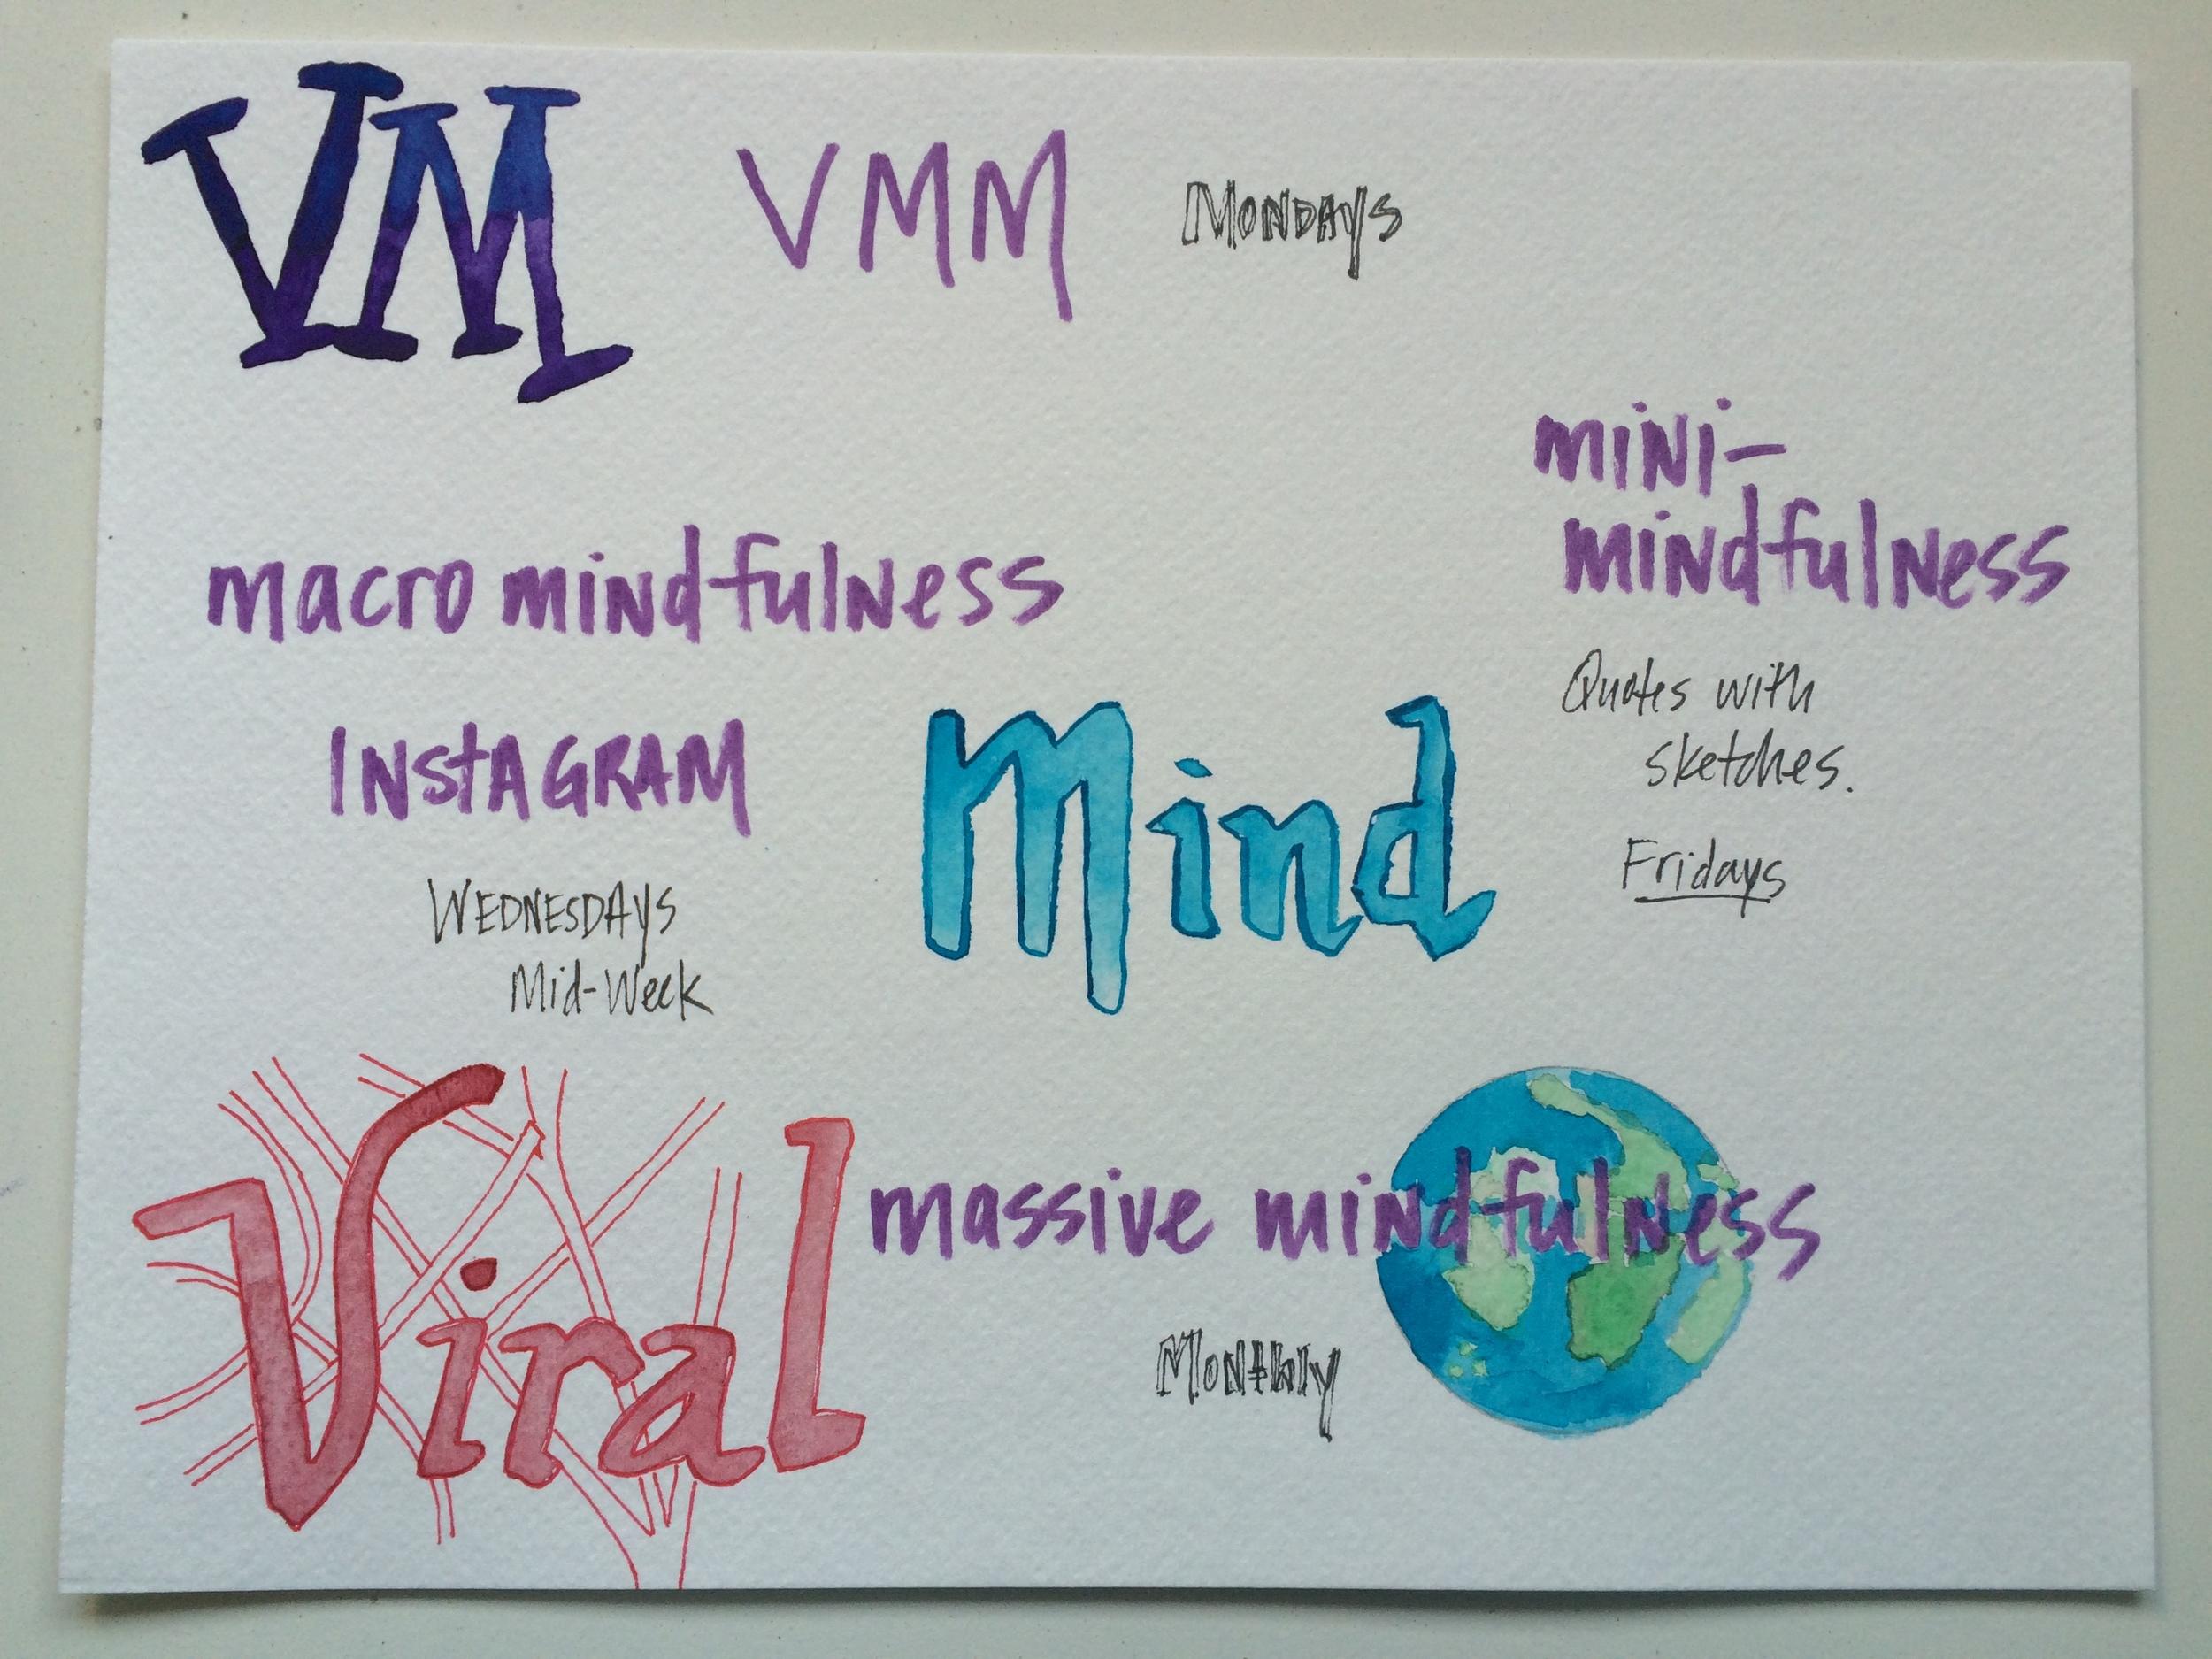 Viral Mindfulness